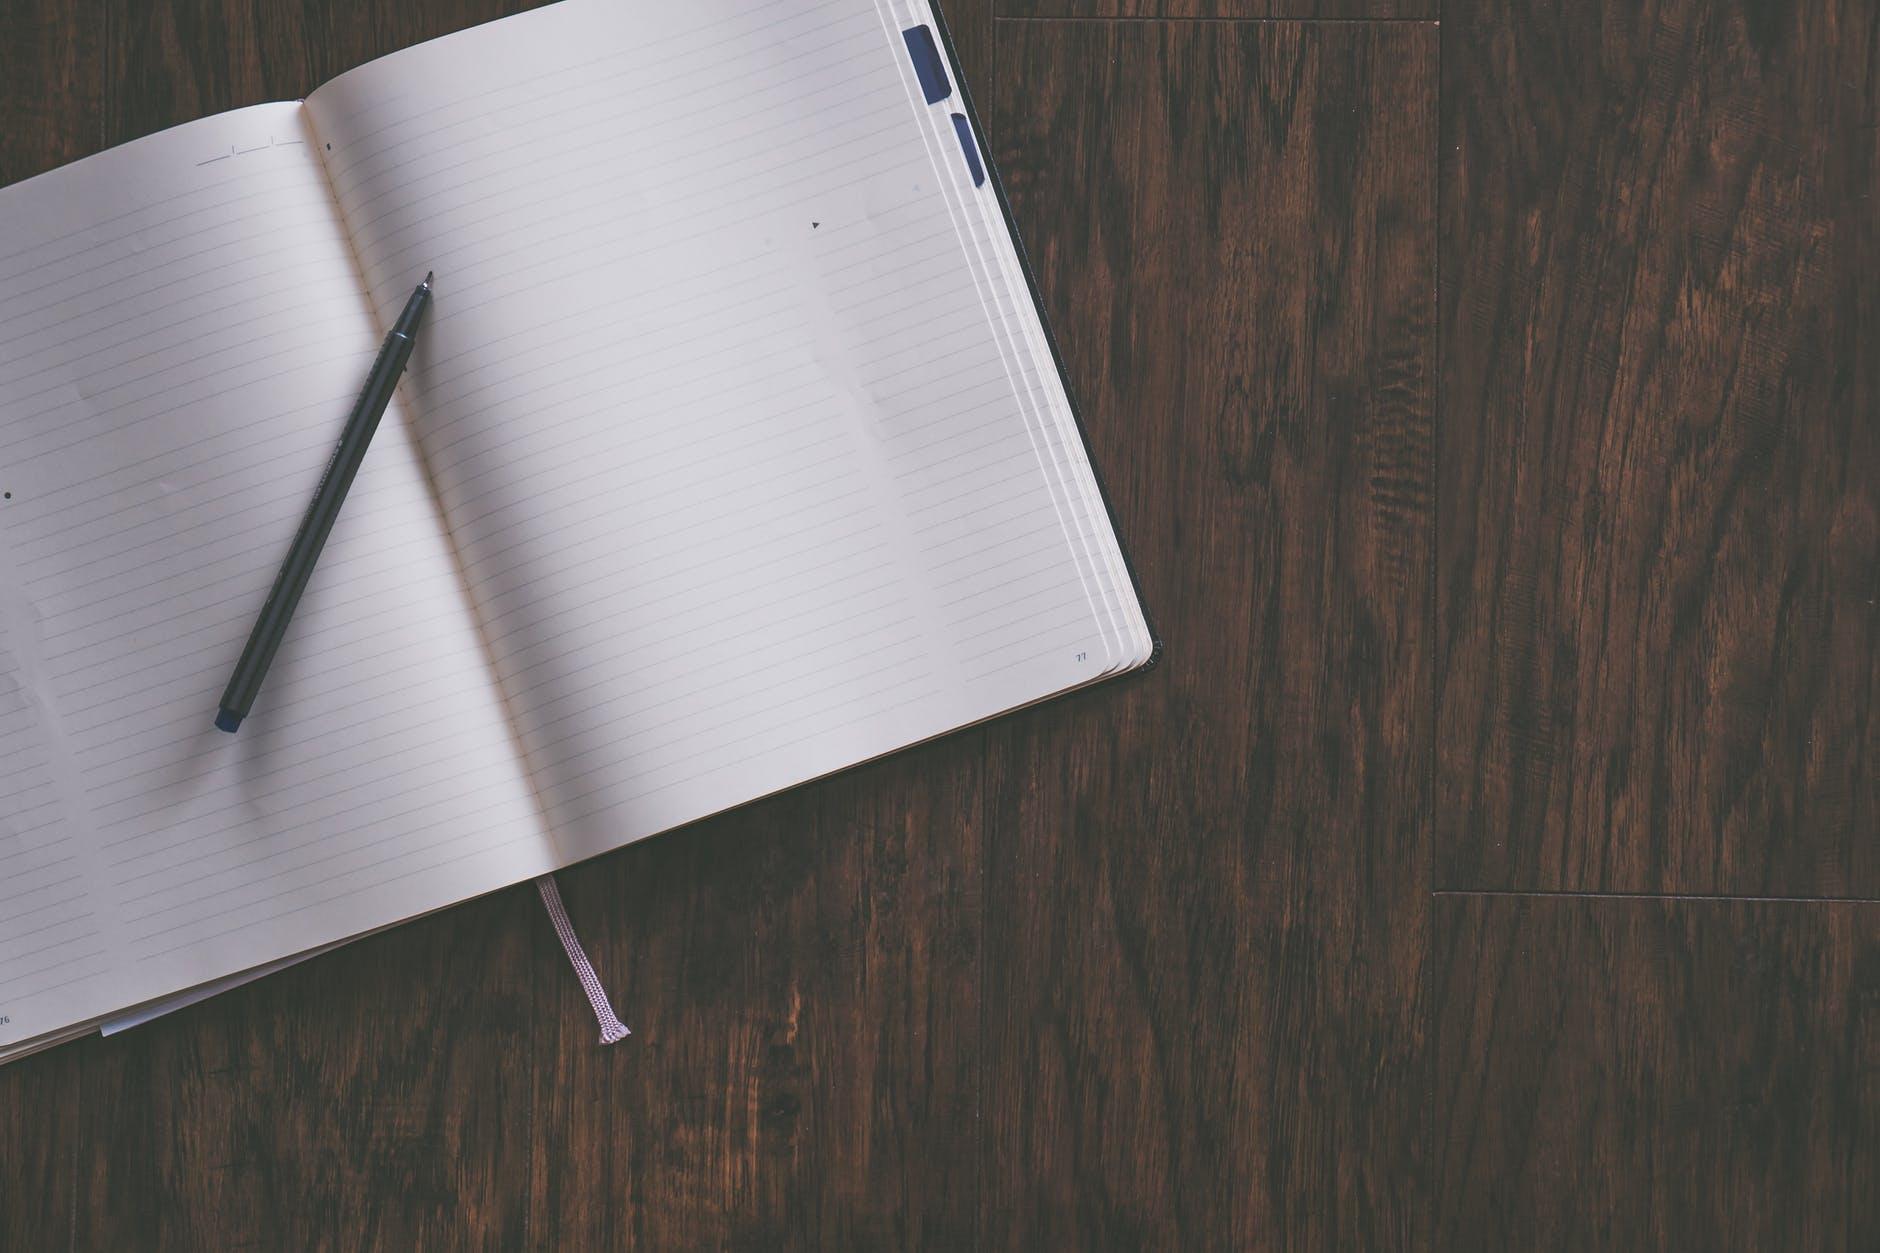 Blank scribbler page